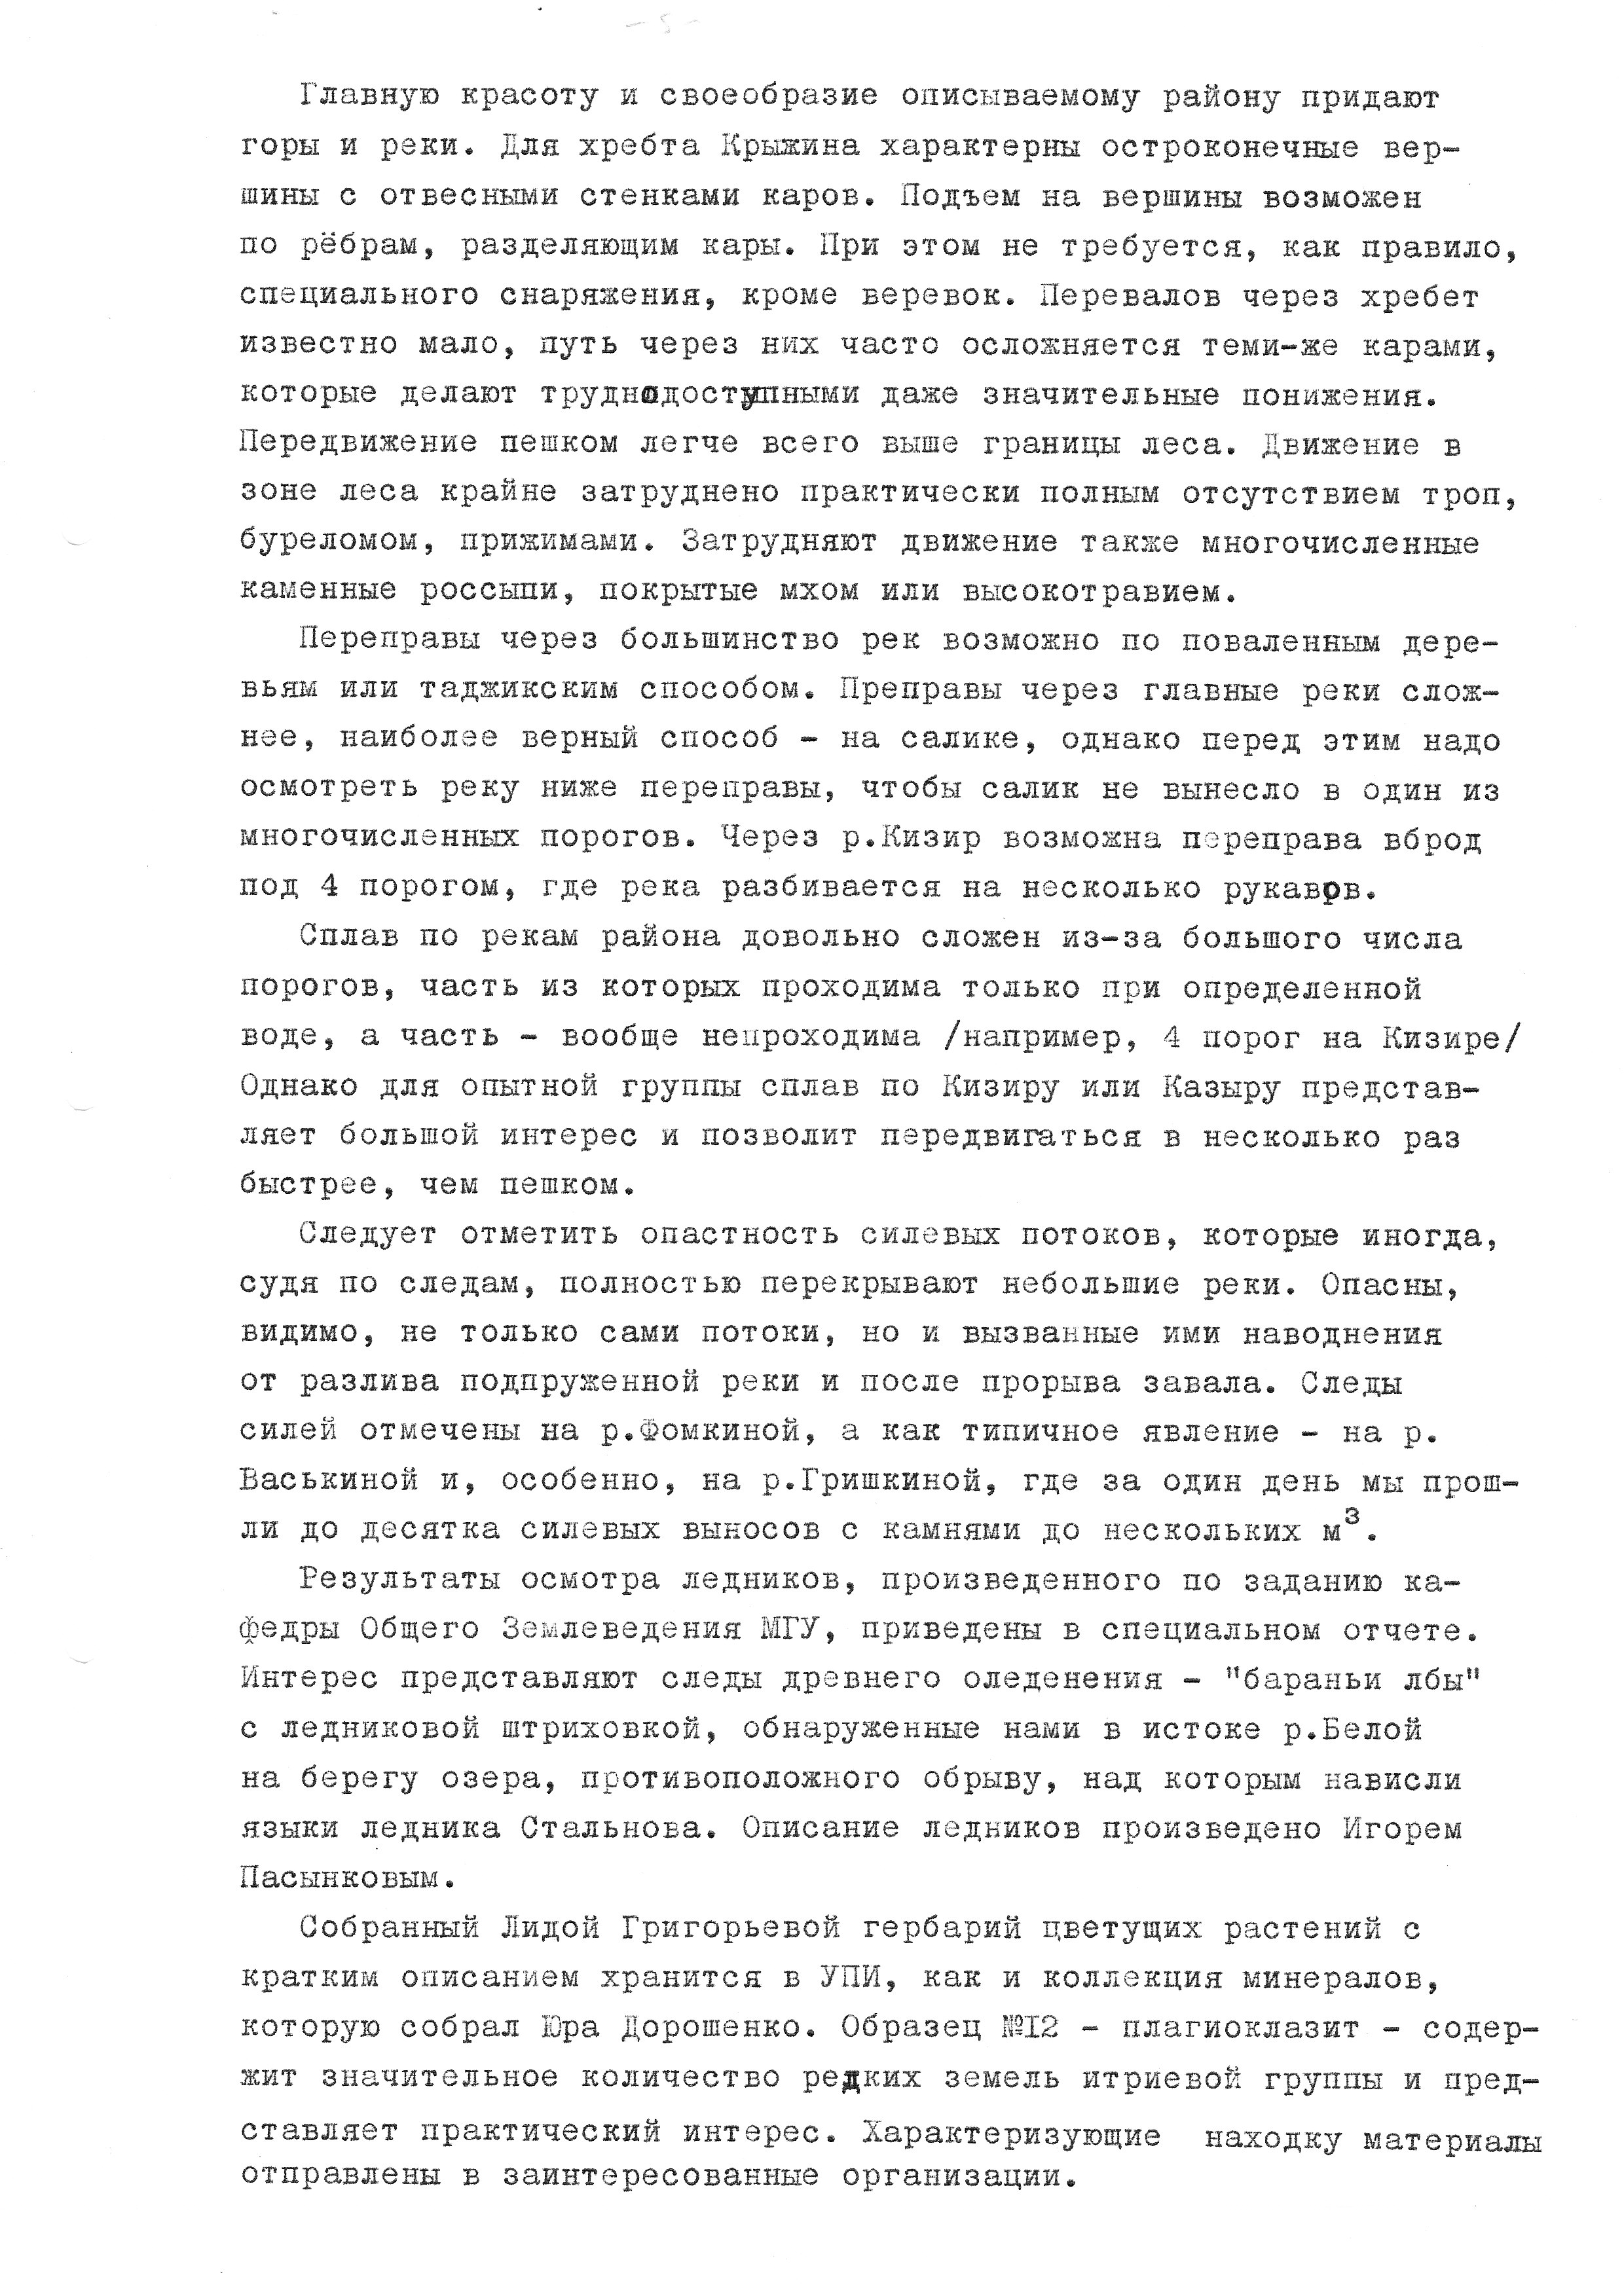 https://img-fotki.yandex.ru/get/6816/164520479.7d/0_e48b3_76e0c4f5_orig.jpg